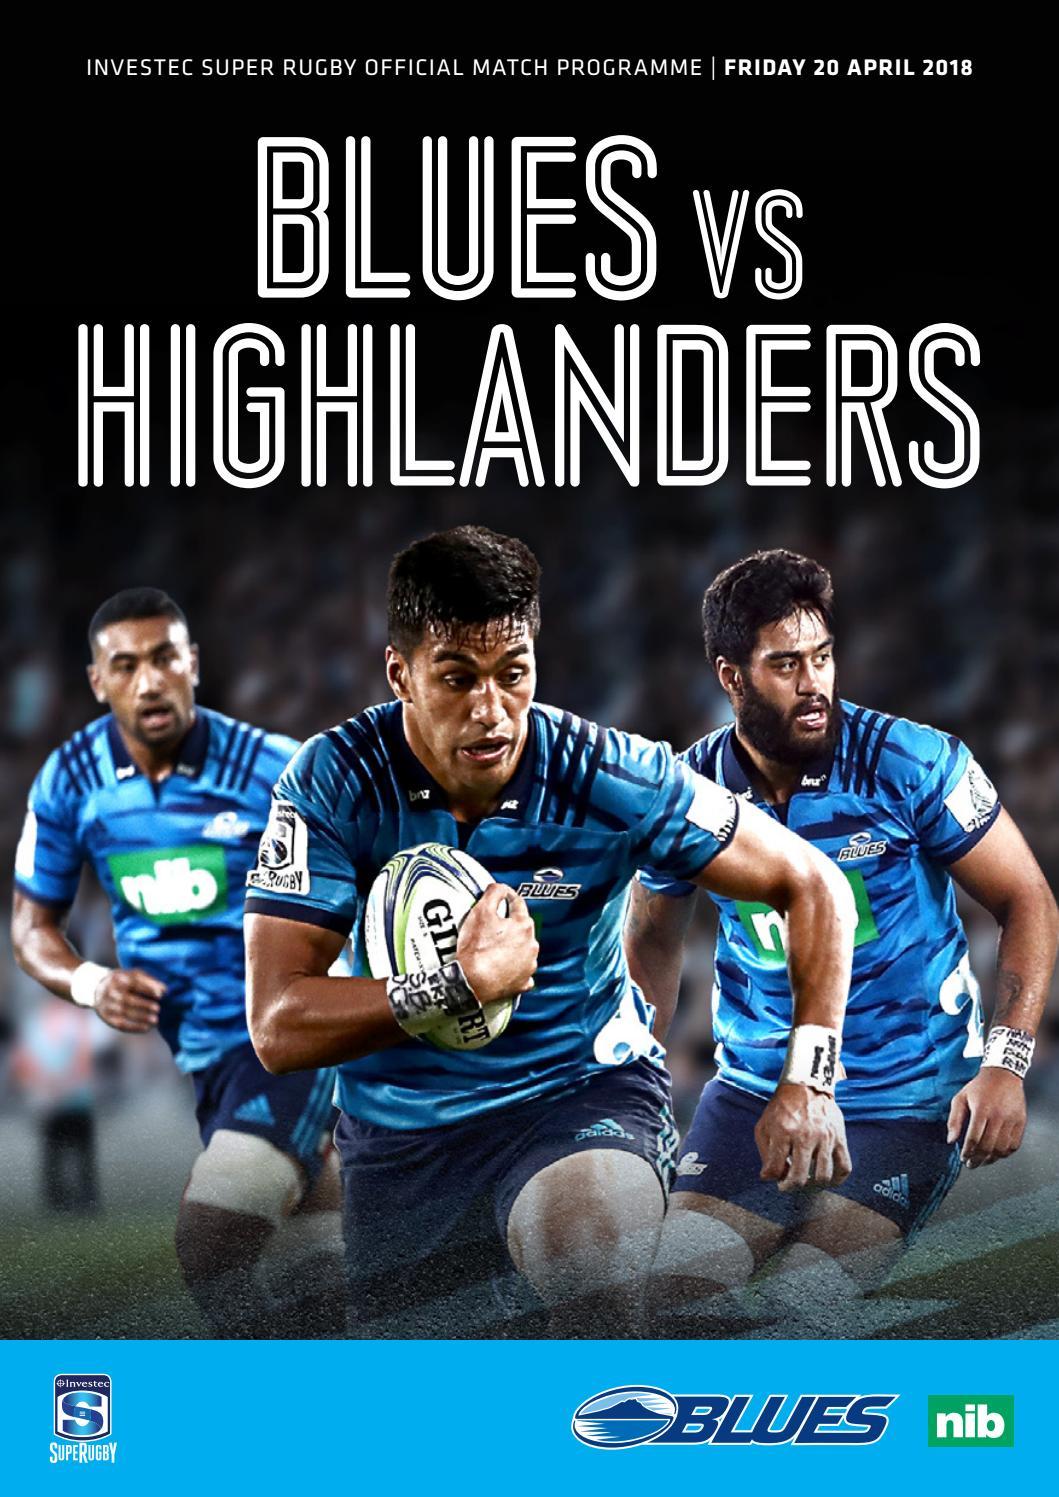 Blues v Highlanders - 20 April 2018 by The Blues Rugby Club - issuu